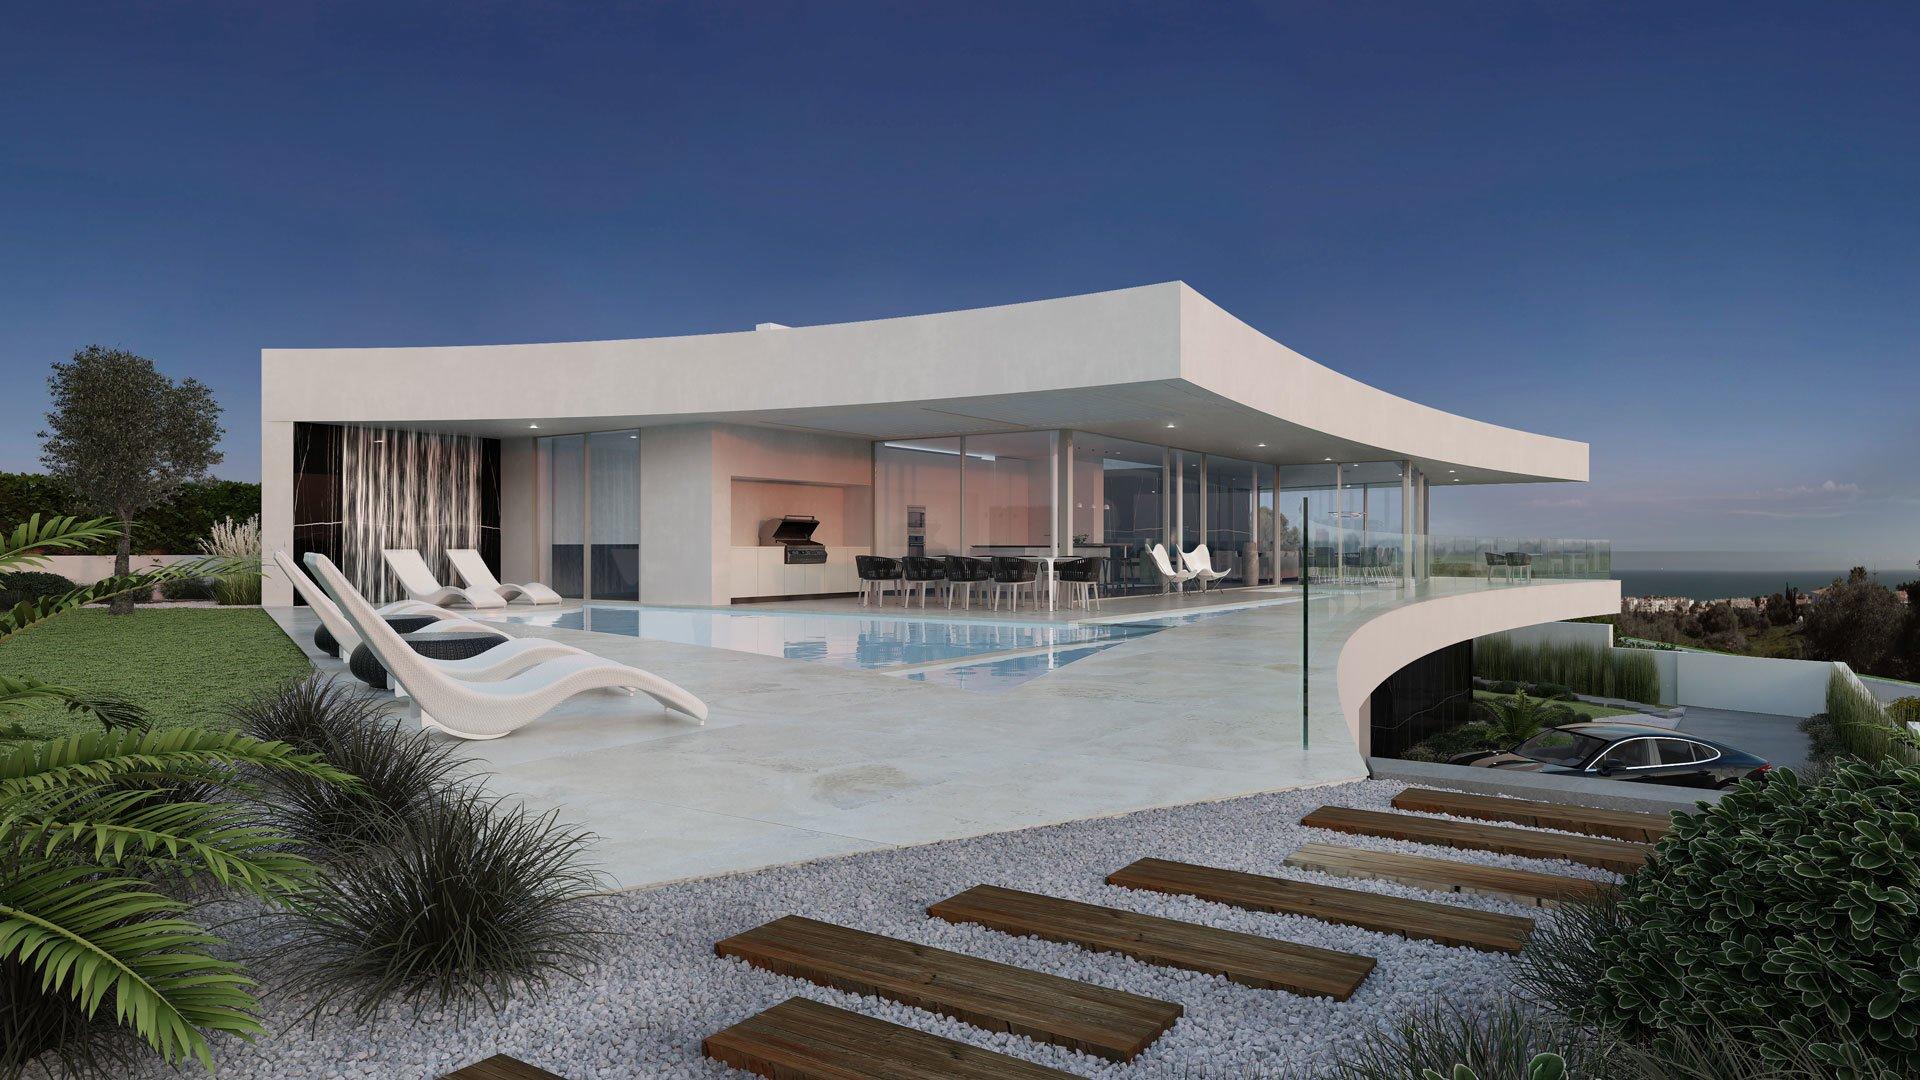 4 Bedroom Villa Praia da Luz, Western Algarve Ref: GV590D